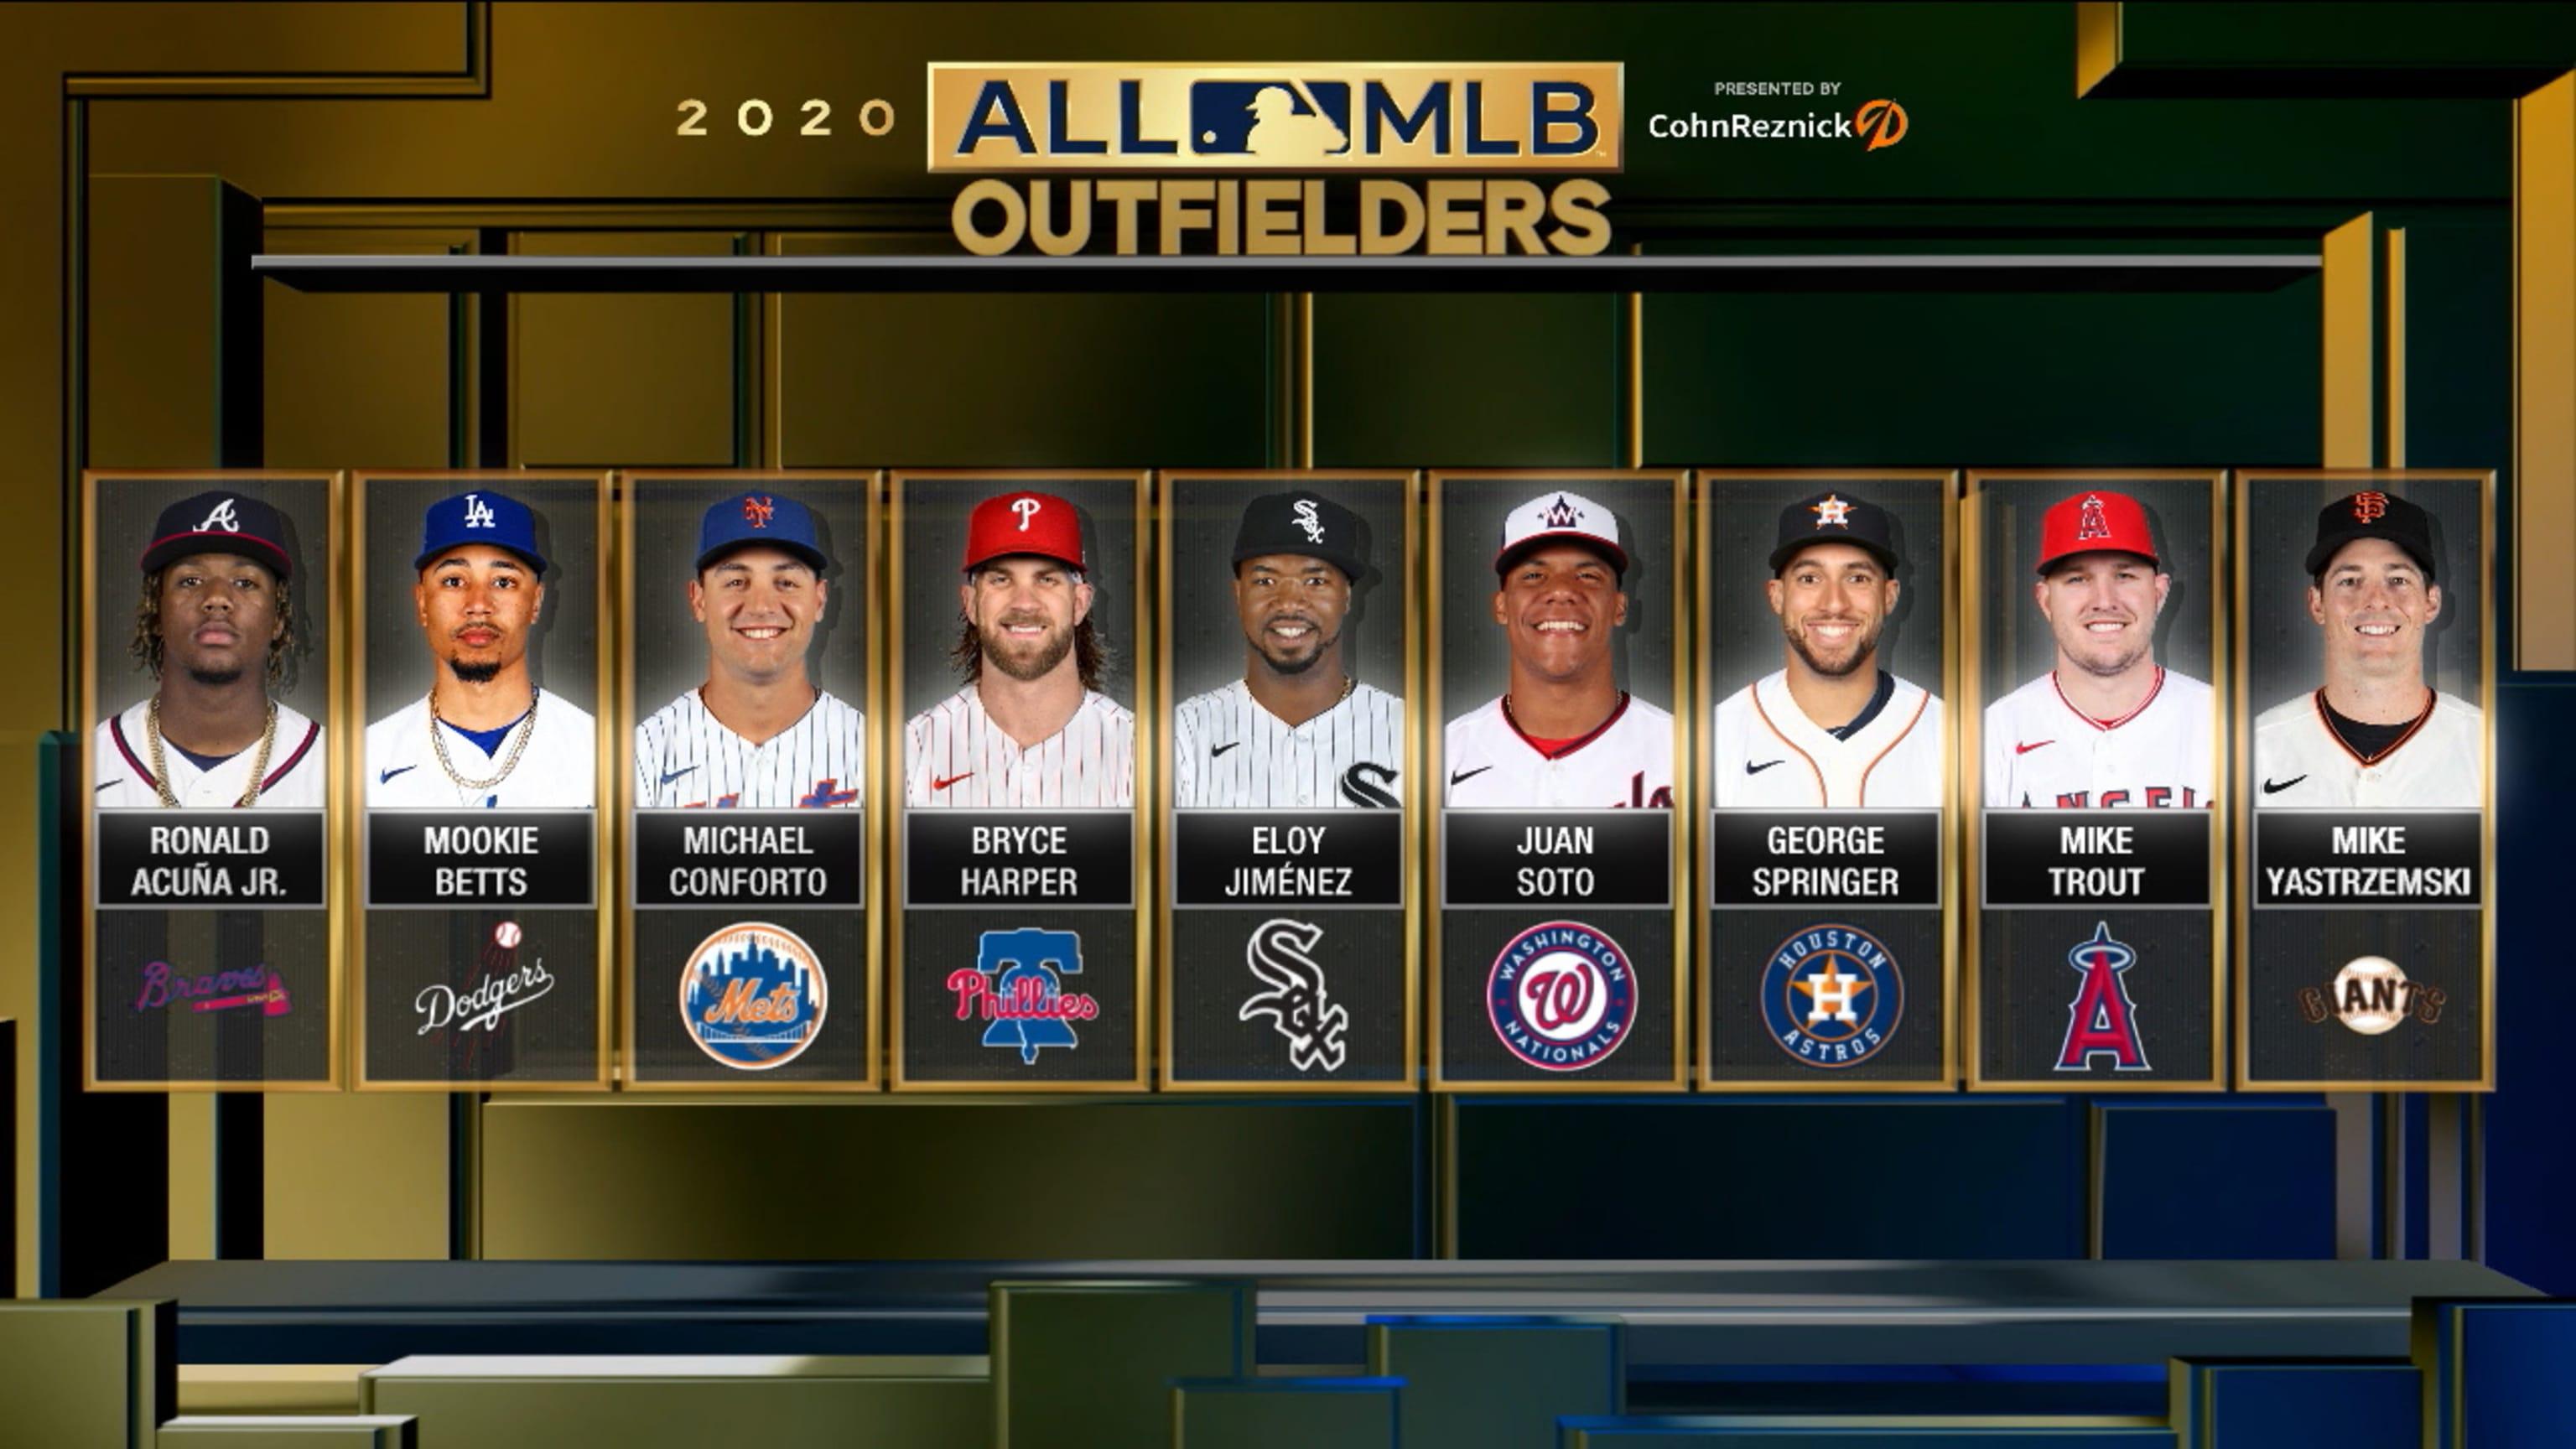 2020 All-MLB Team OF finalists